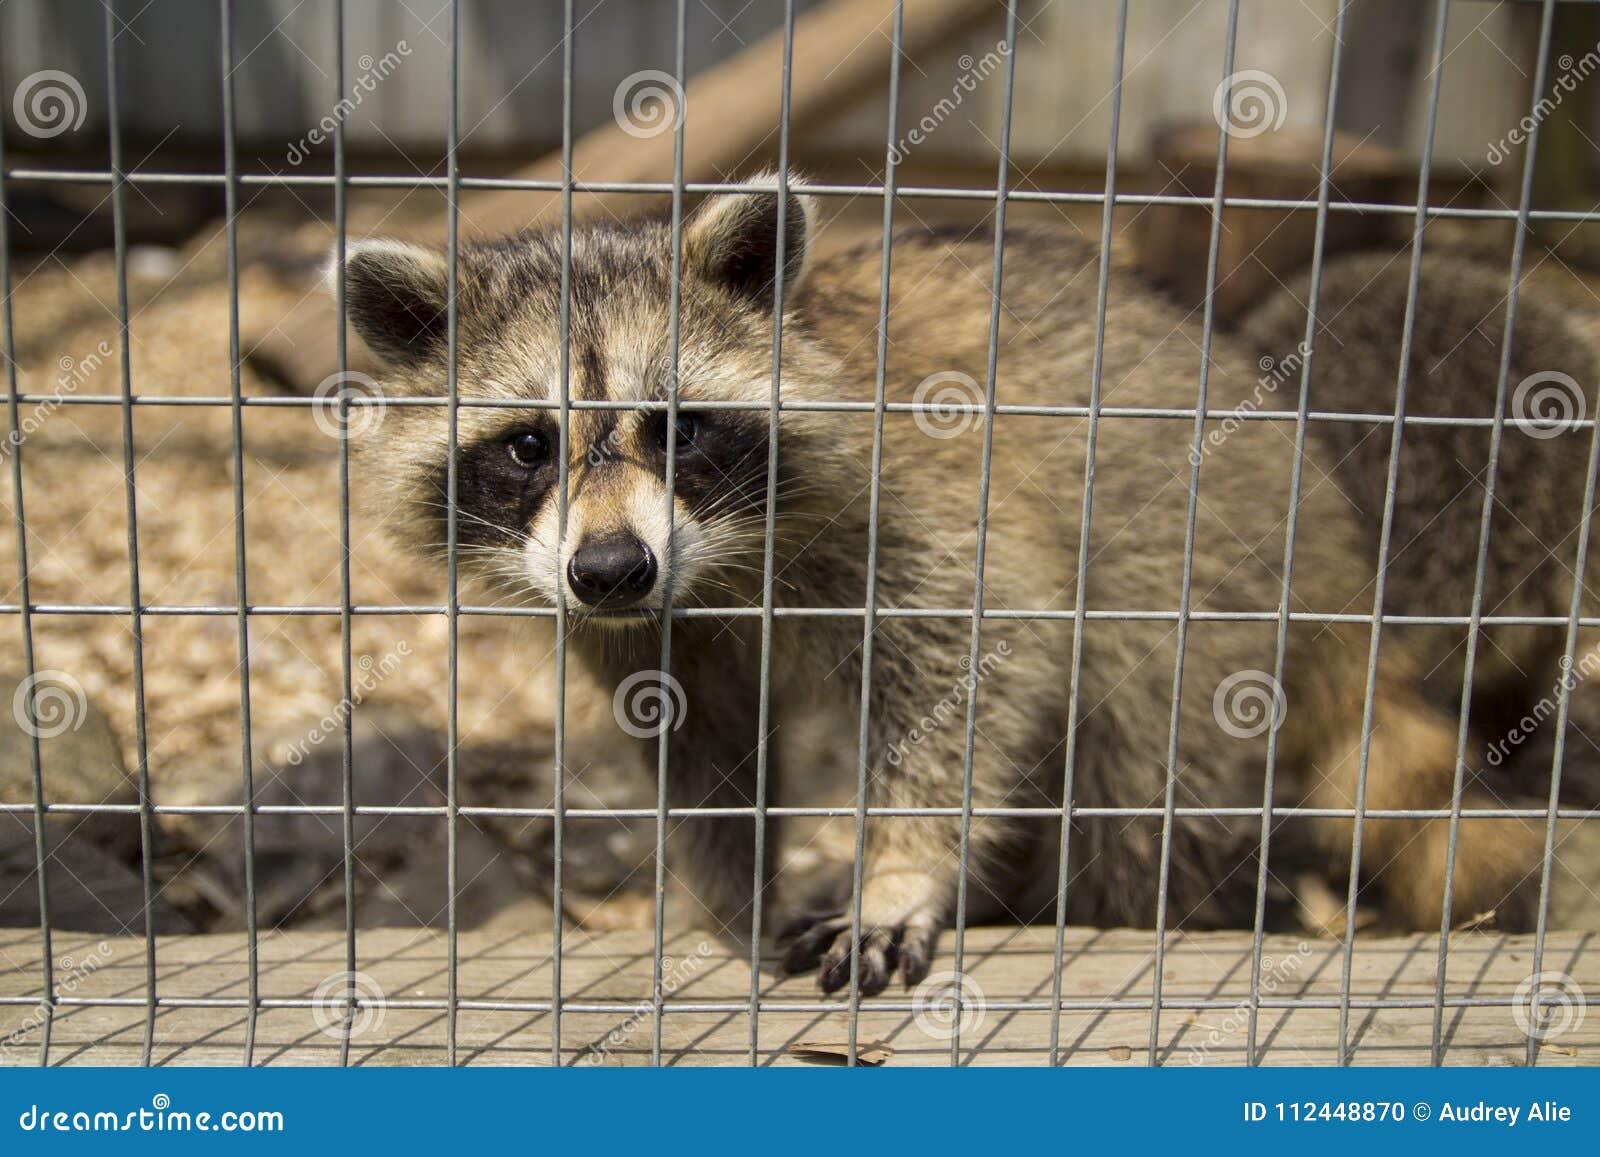 Sad raccoon, looking through its cage.